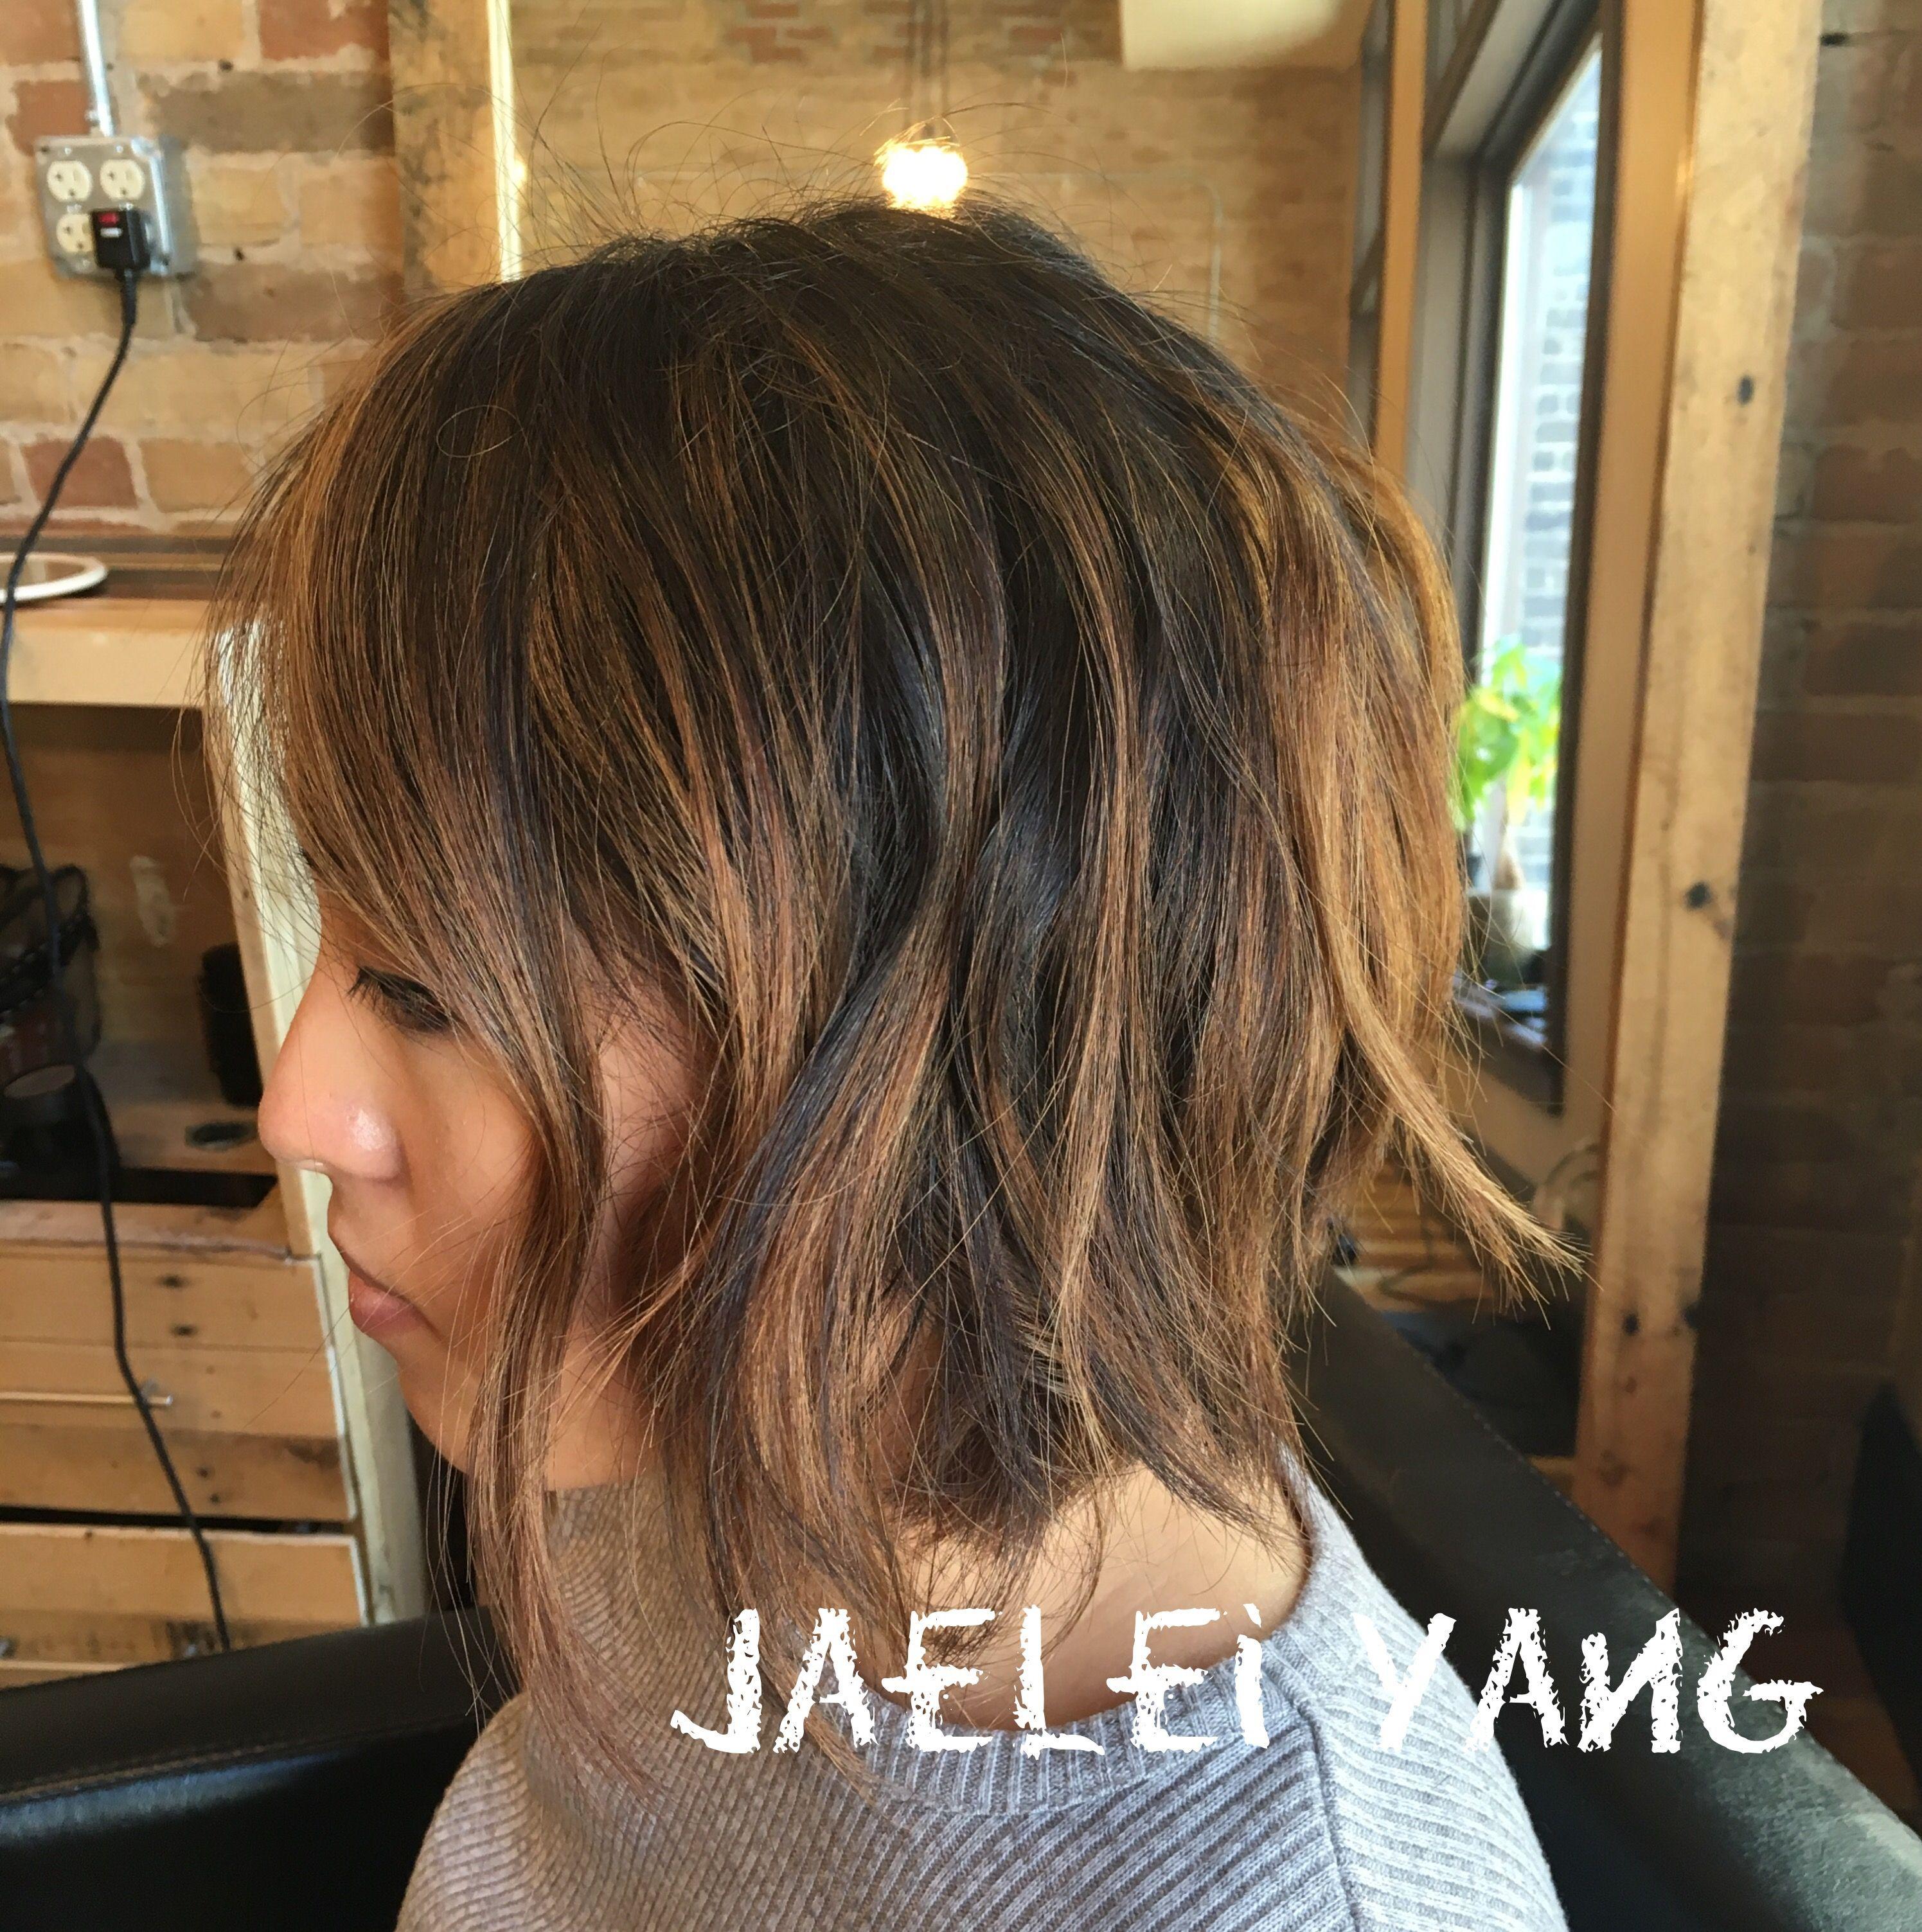 Dark Brunette Caramel Highlights Balayage On Bob Jaelei Does Hair